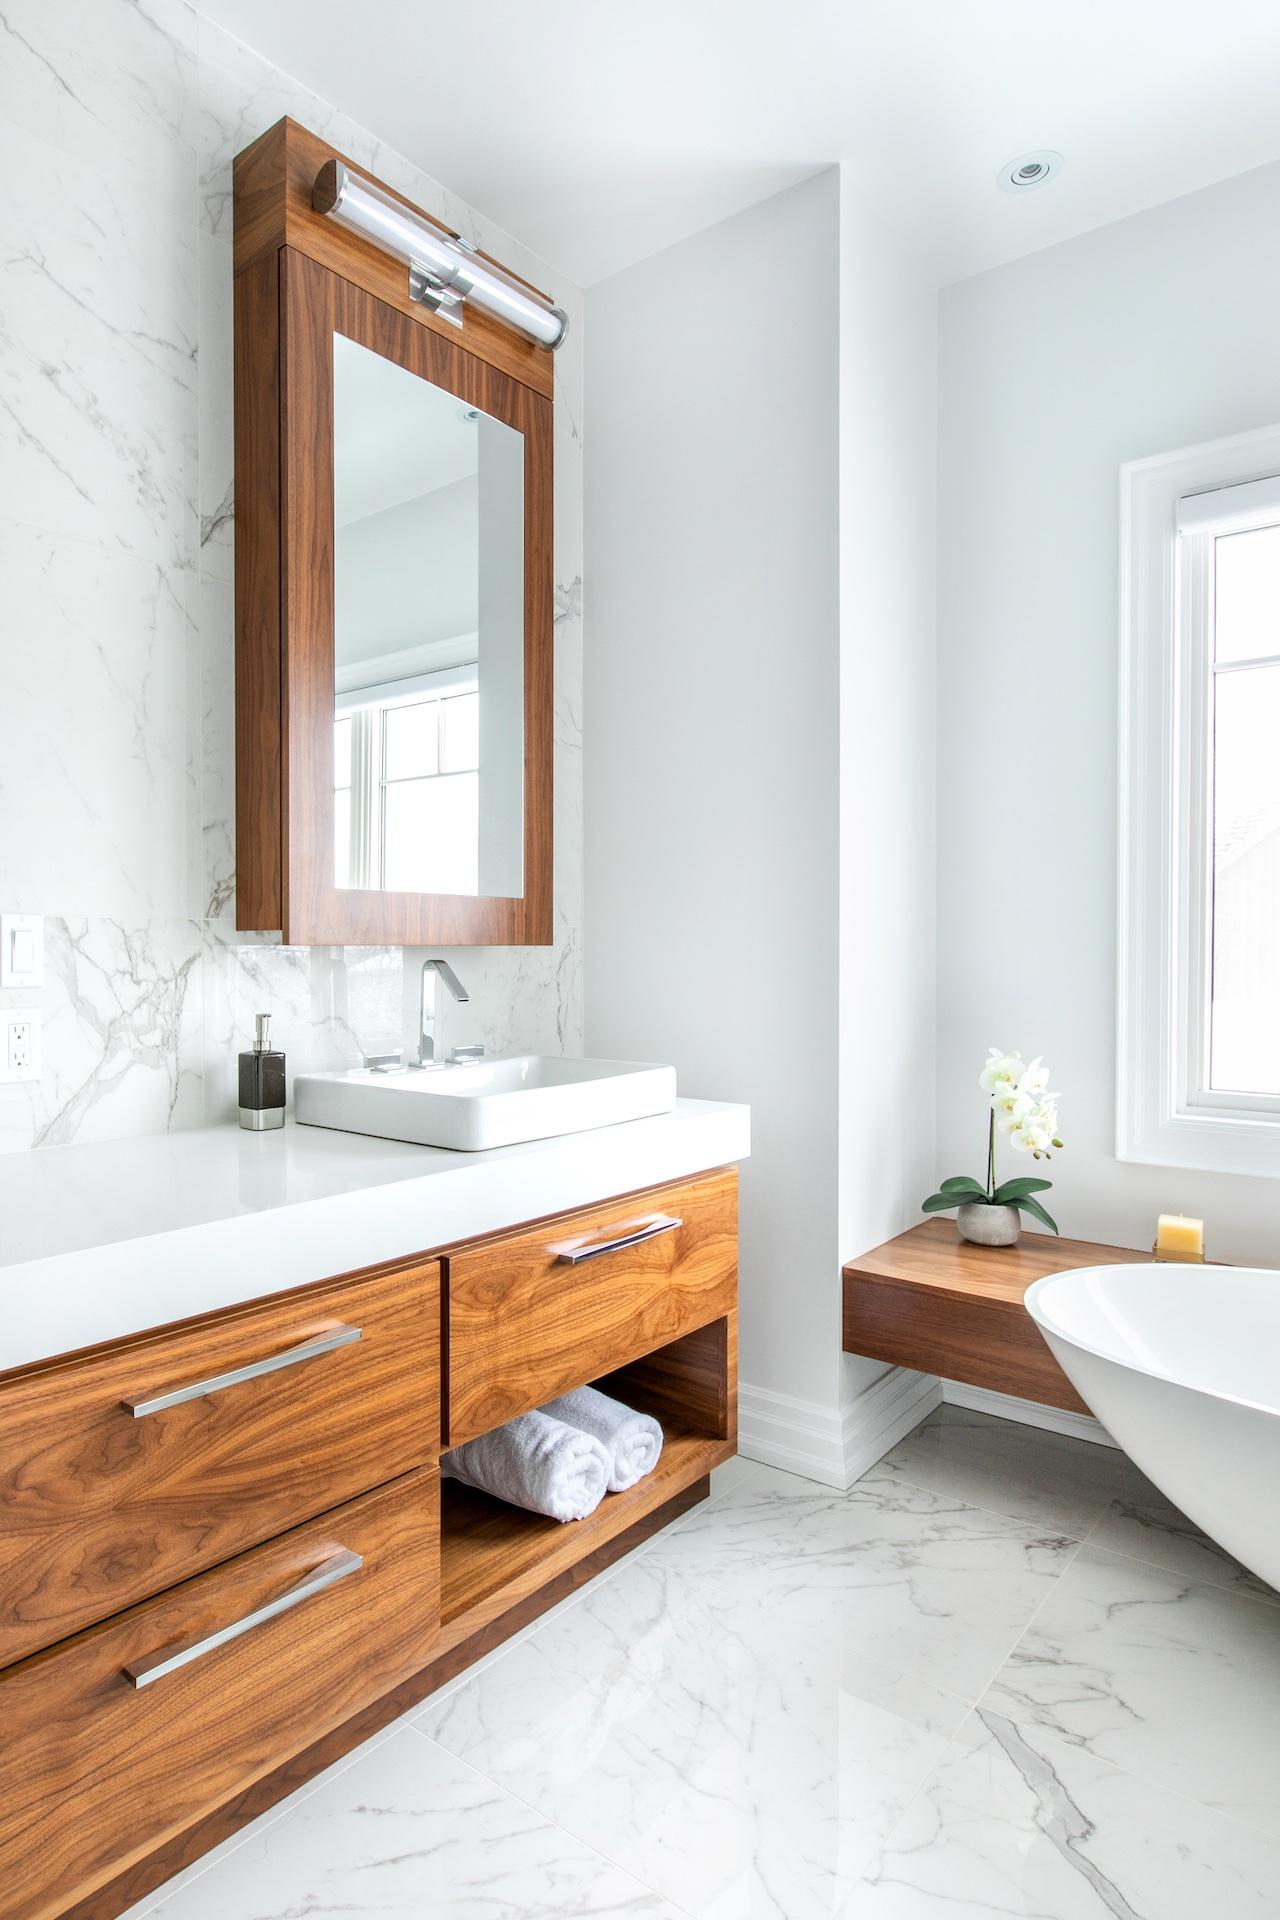 wood vanity and white sink